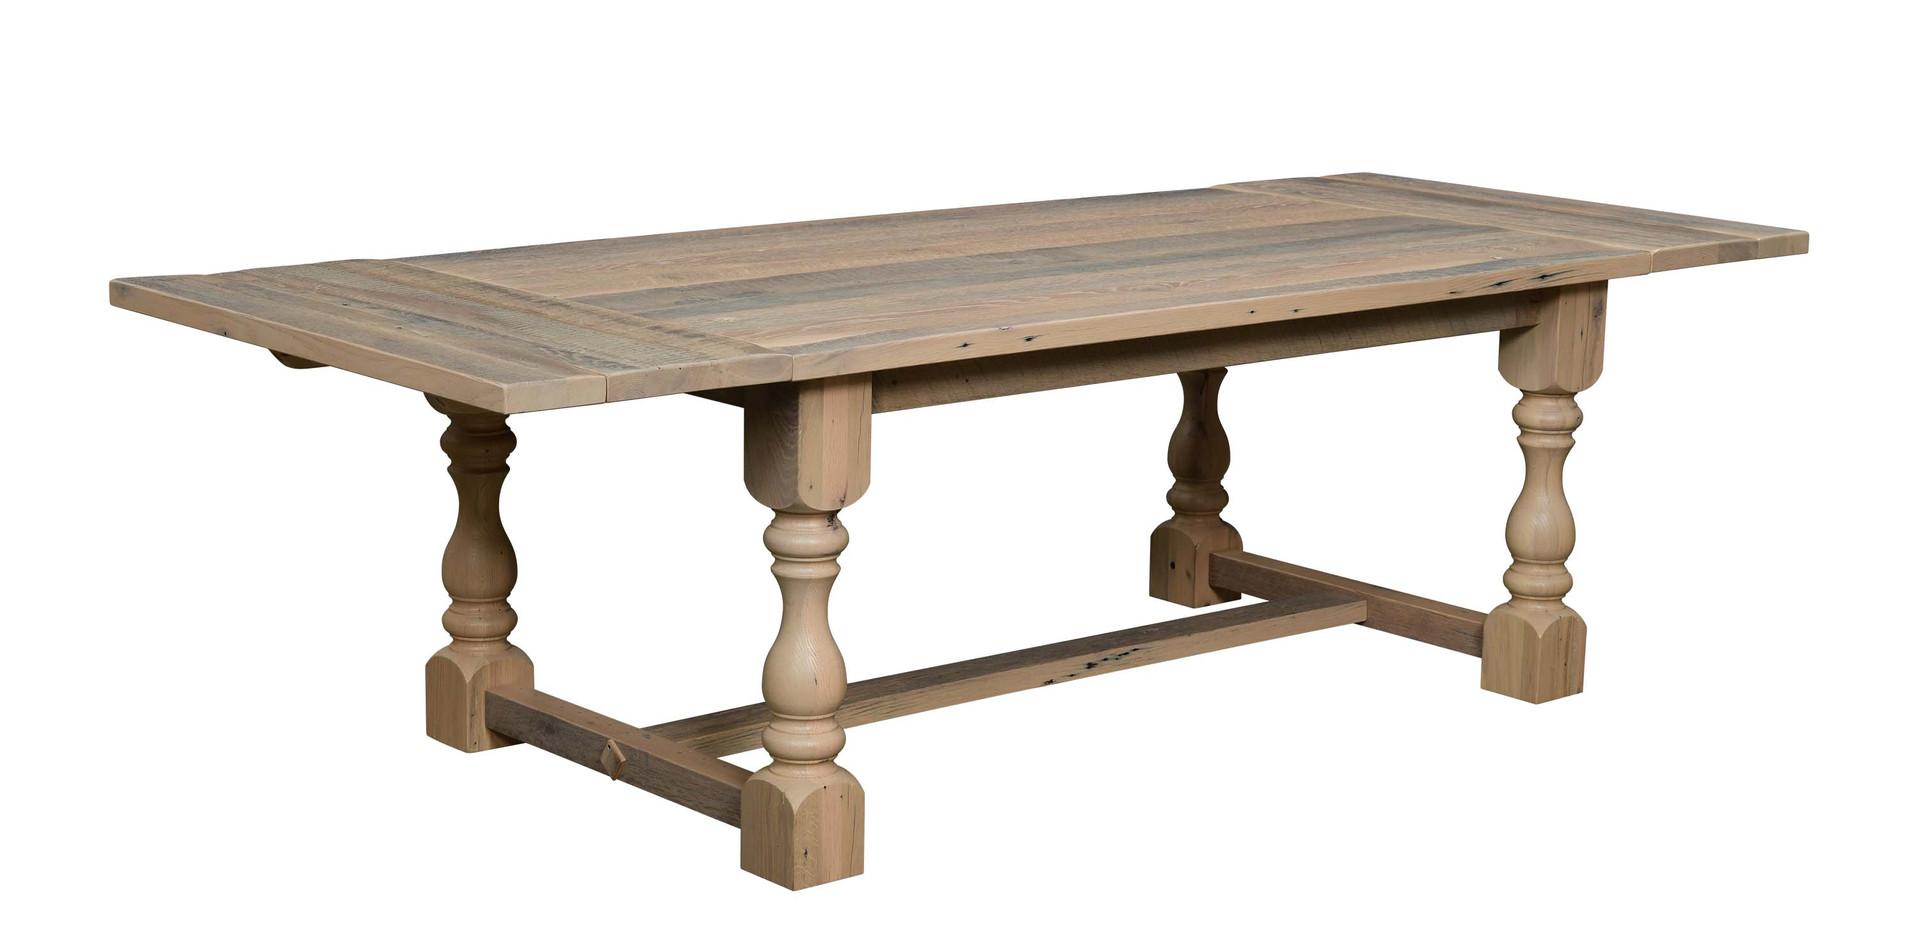 Midland Extendable Table